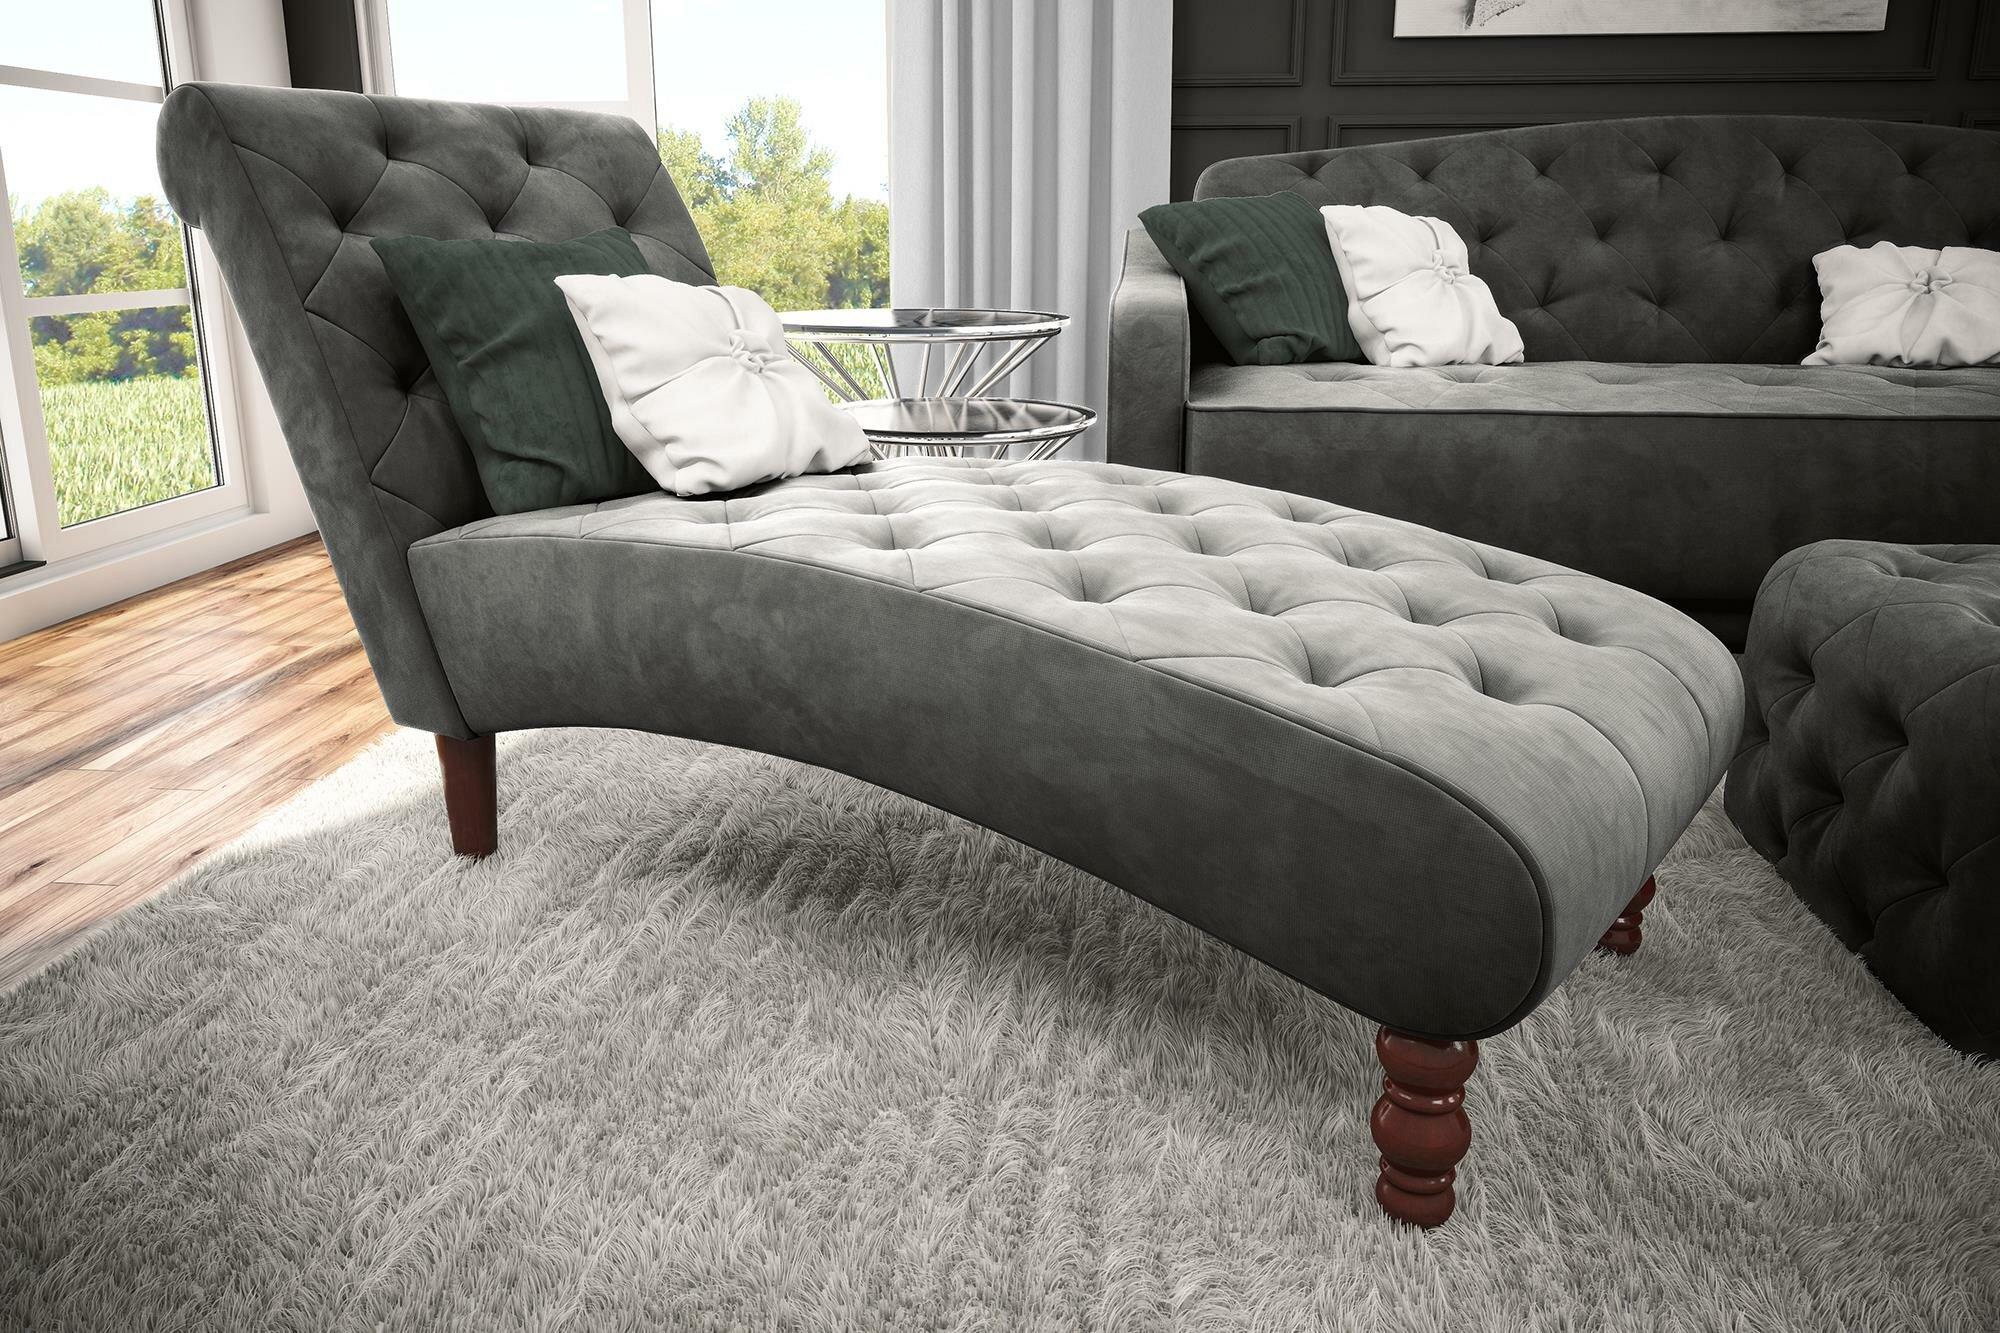 Pleasant Vintage Chaise Lounge Creativecarmelina Interior Chair Design Creativecarmelinacom